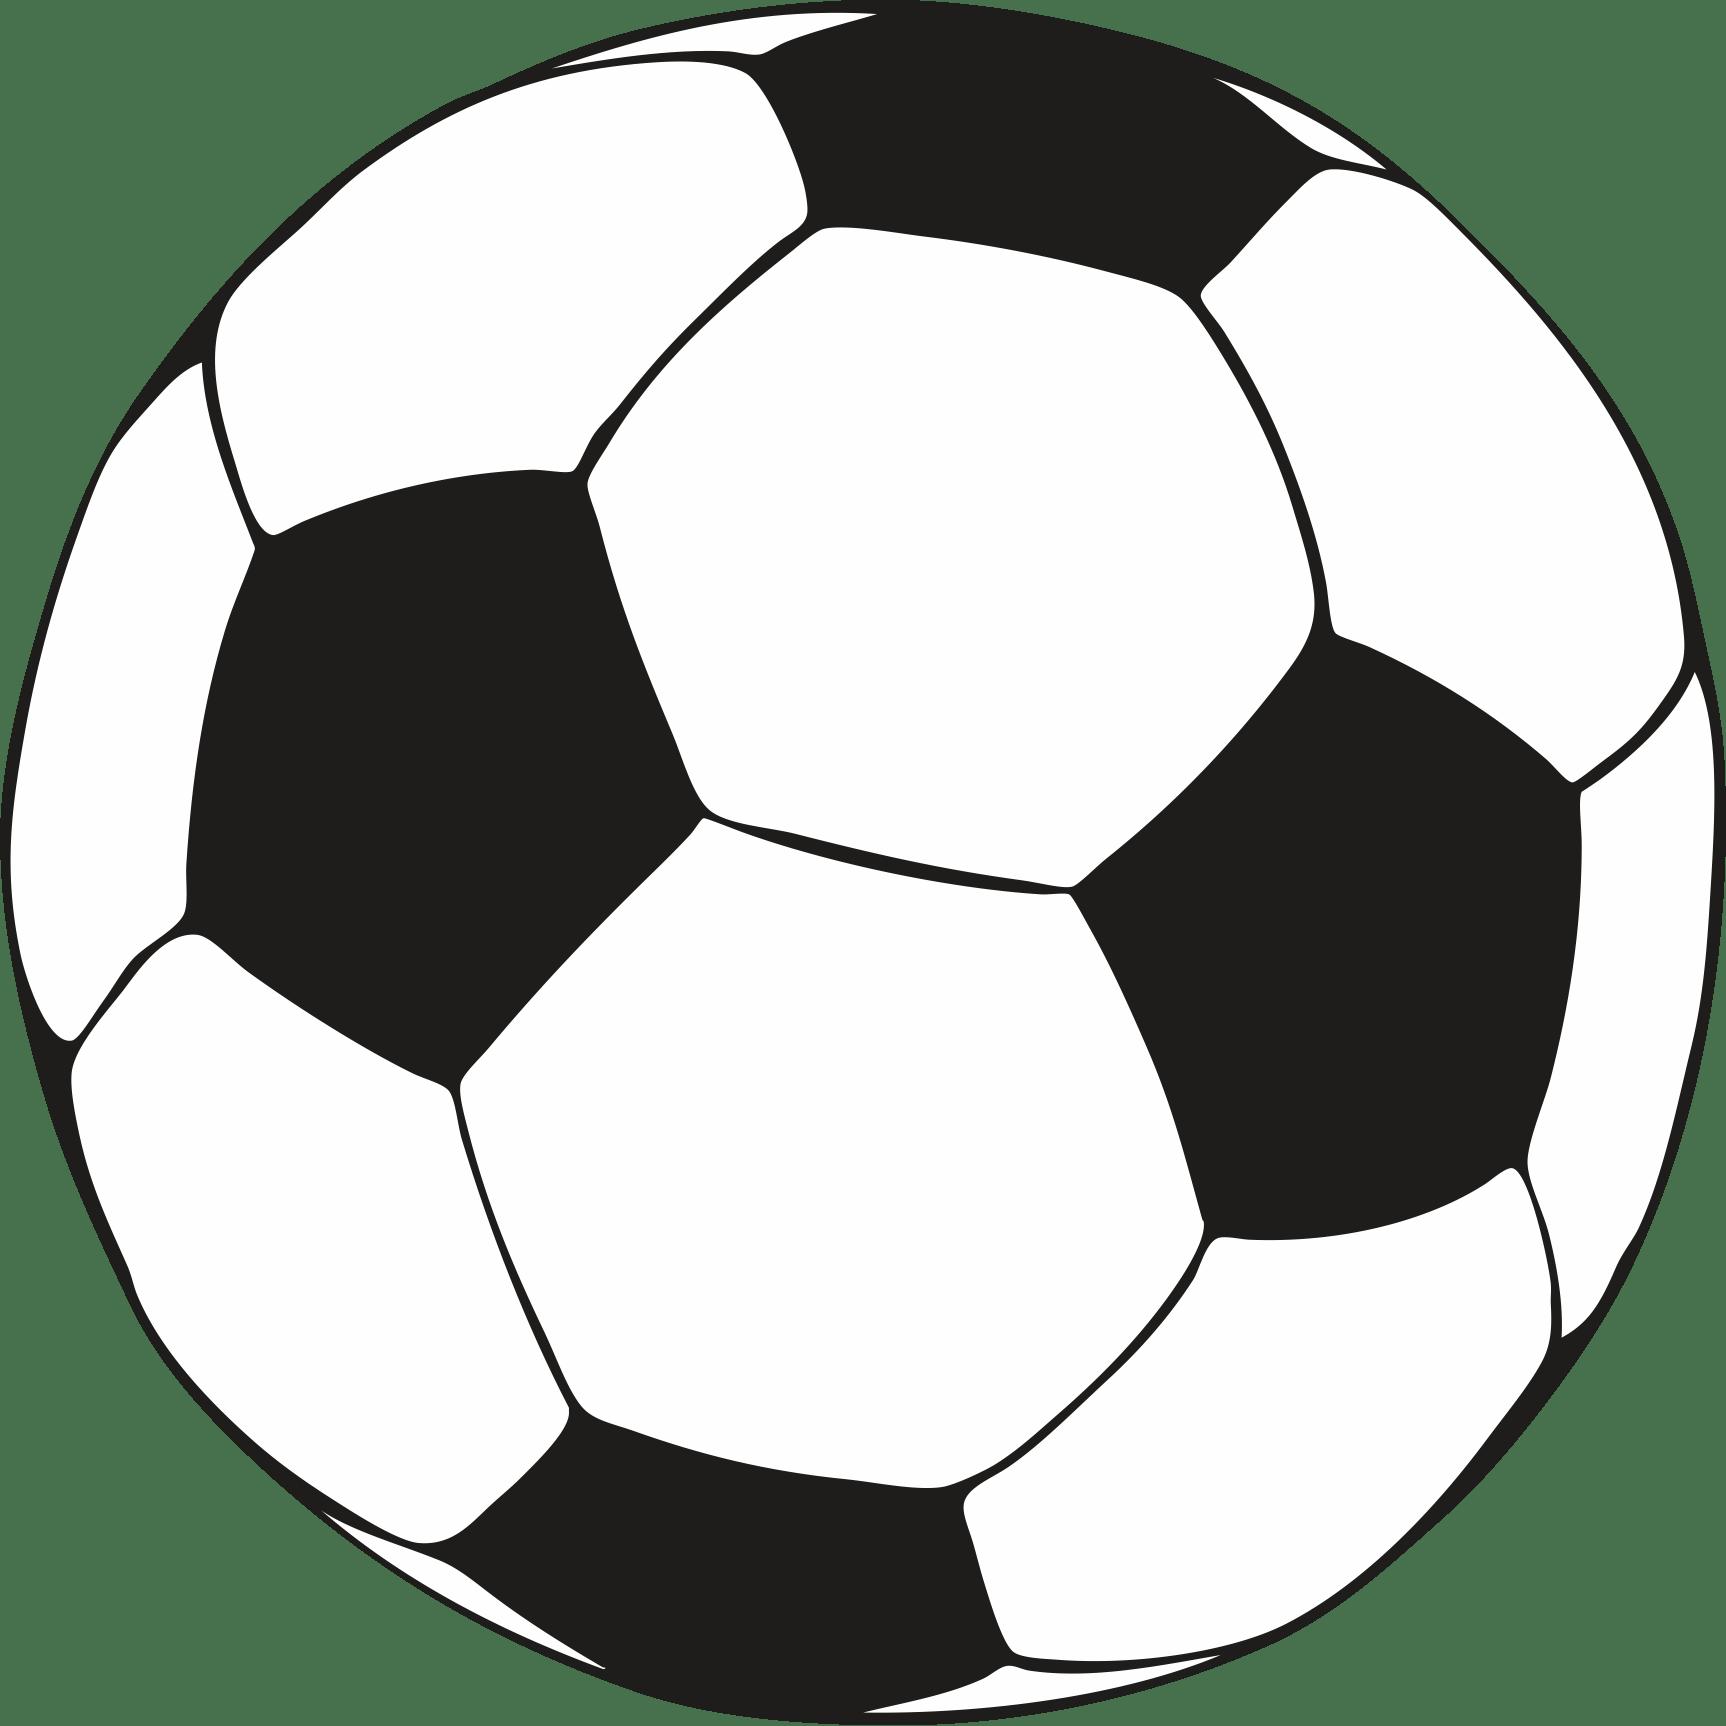 Baseballs basketballs football soccer ball clipart jpg transparent download Soccer Ball Coloring Pages Free Coloring Pages Download | Xsibe ... jpg transparent download